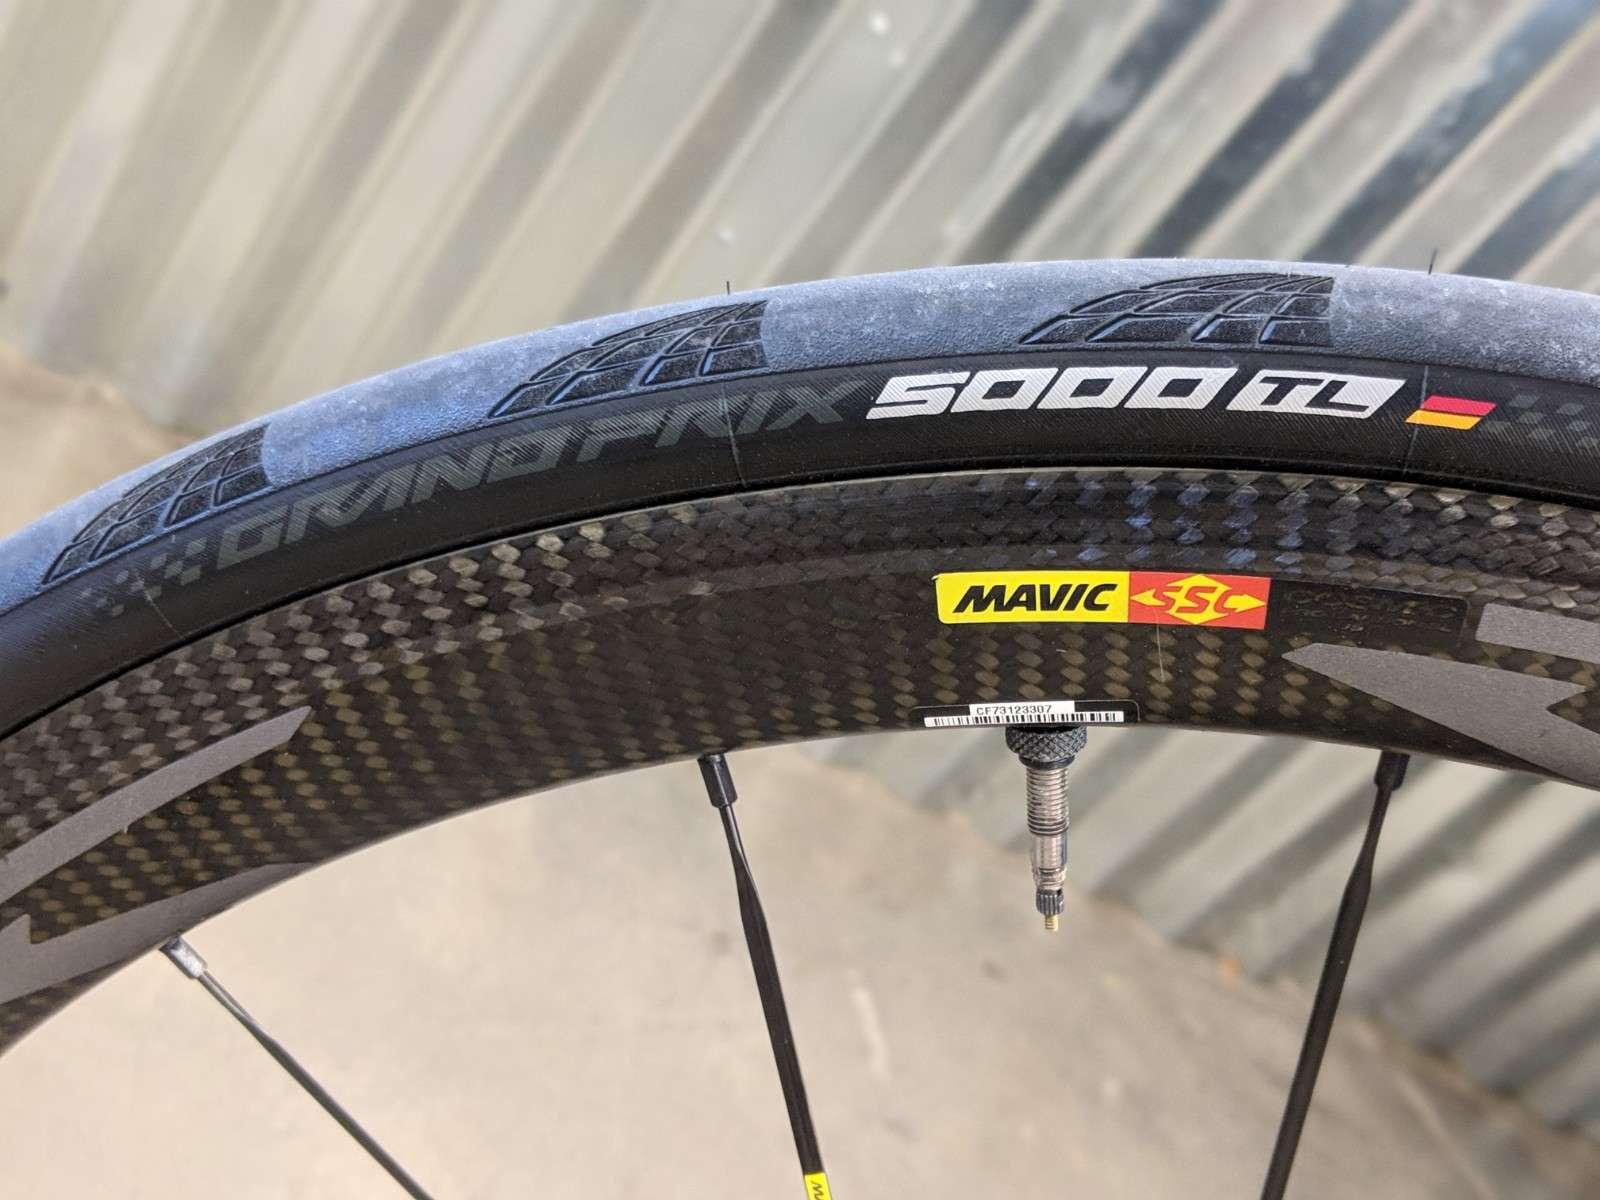 Continental GP 5000 tire